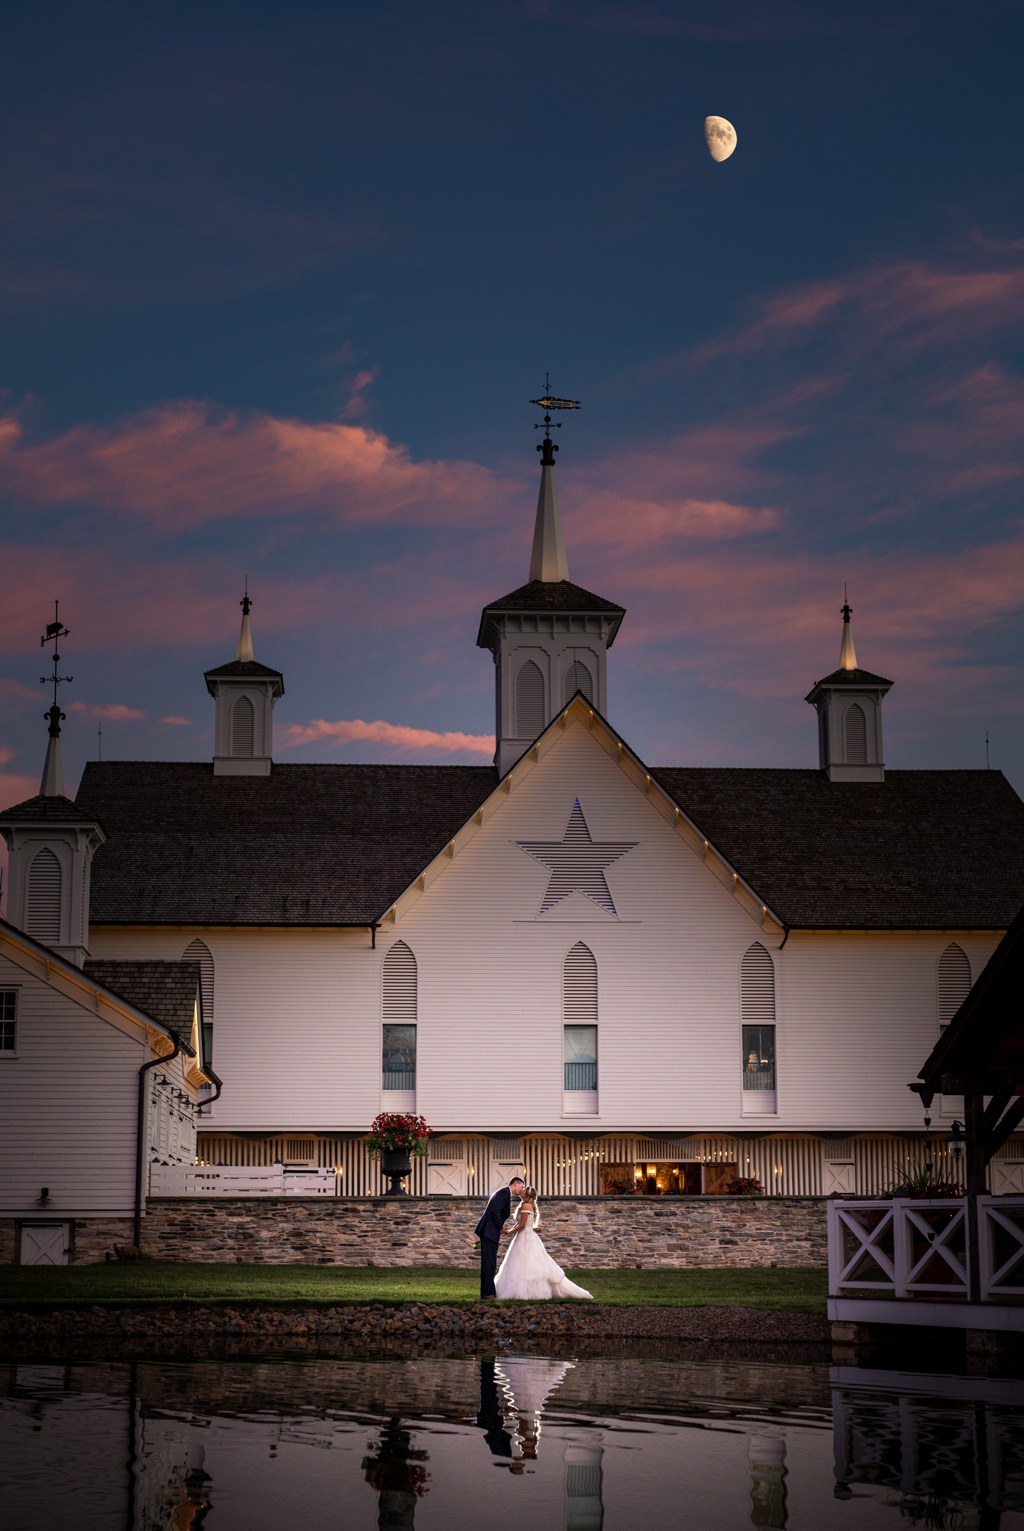 moon rising over the star barn wedding at sunset